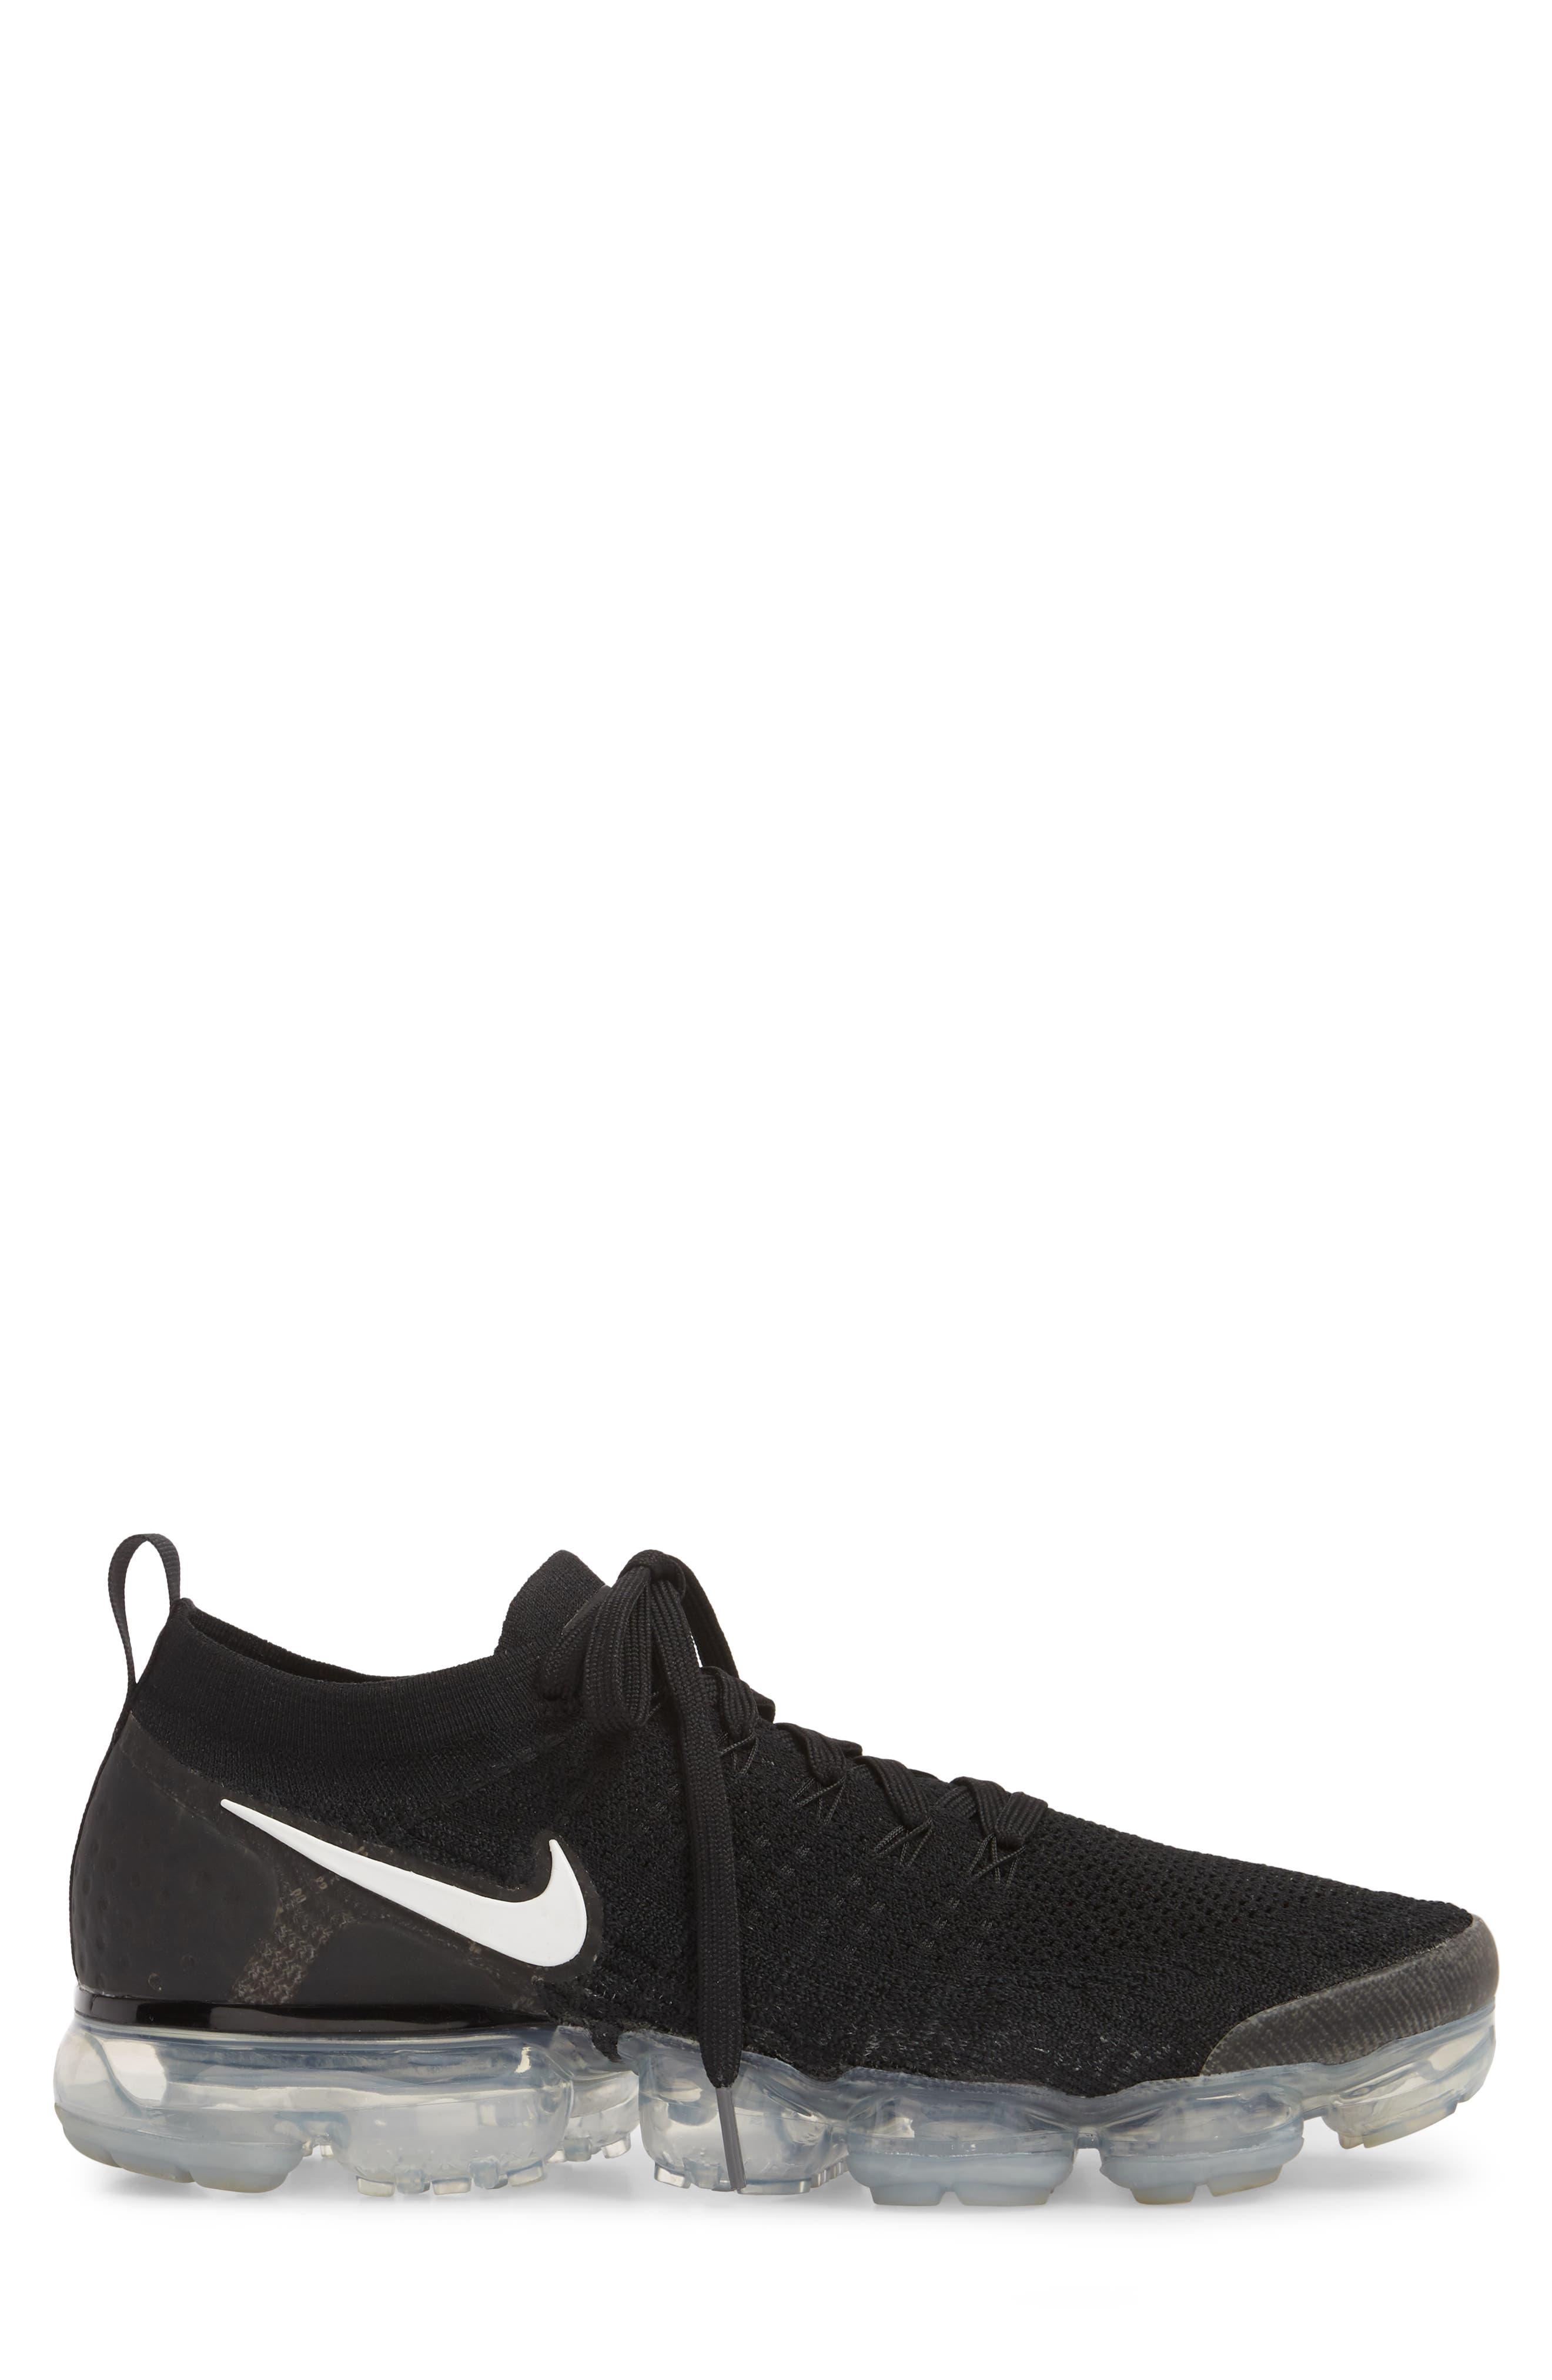 Air Vapormax Flyknit 2 Running Shoe,                             Alternate thumbnail 3, color,                             Black/ White/ Dark Grey